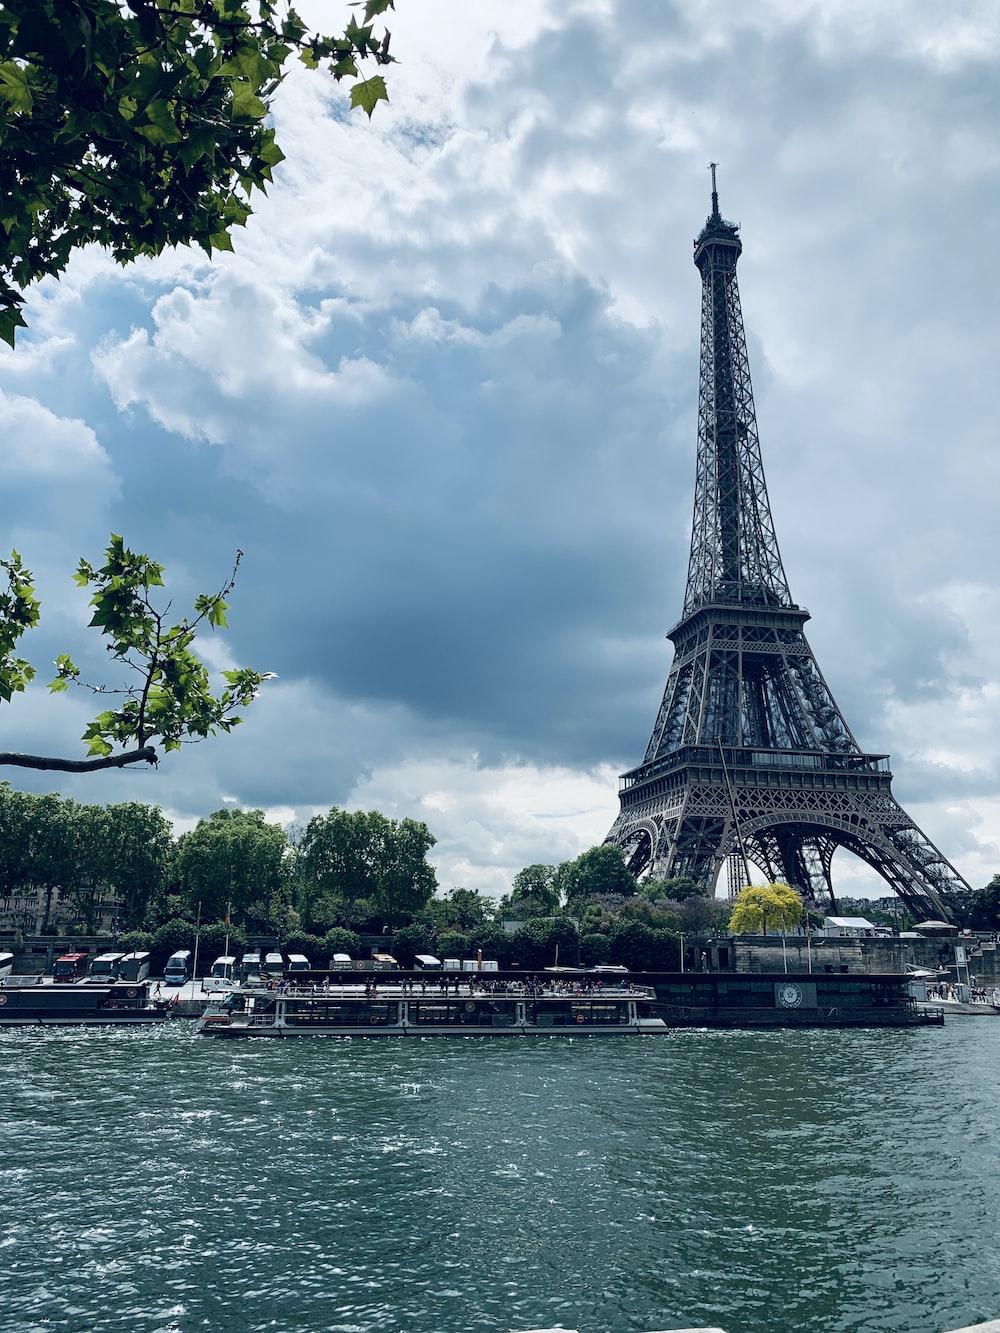 Eiffel tower during daytime